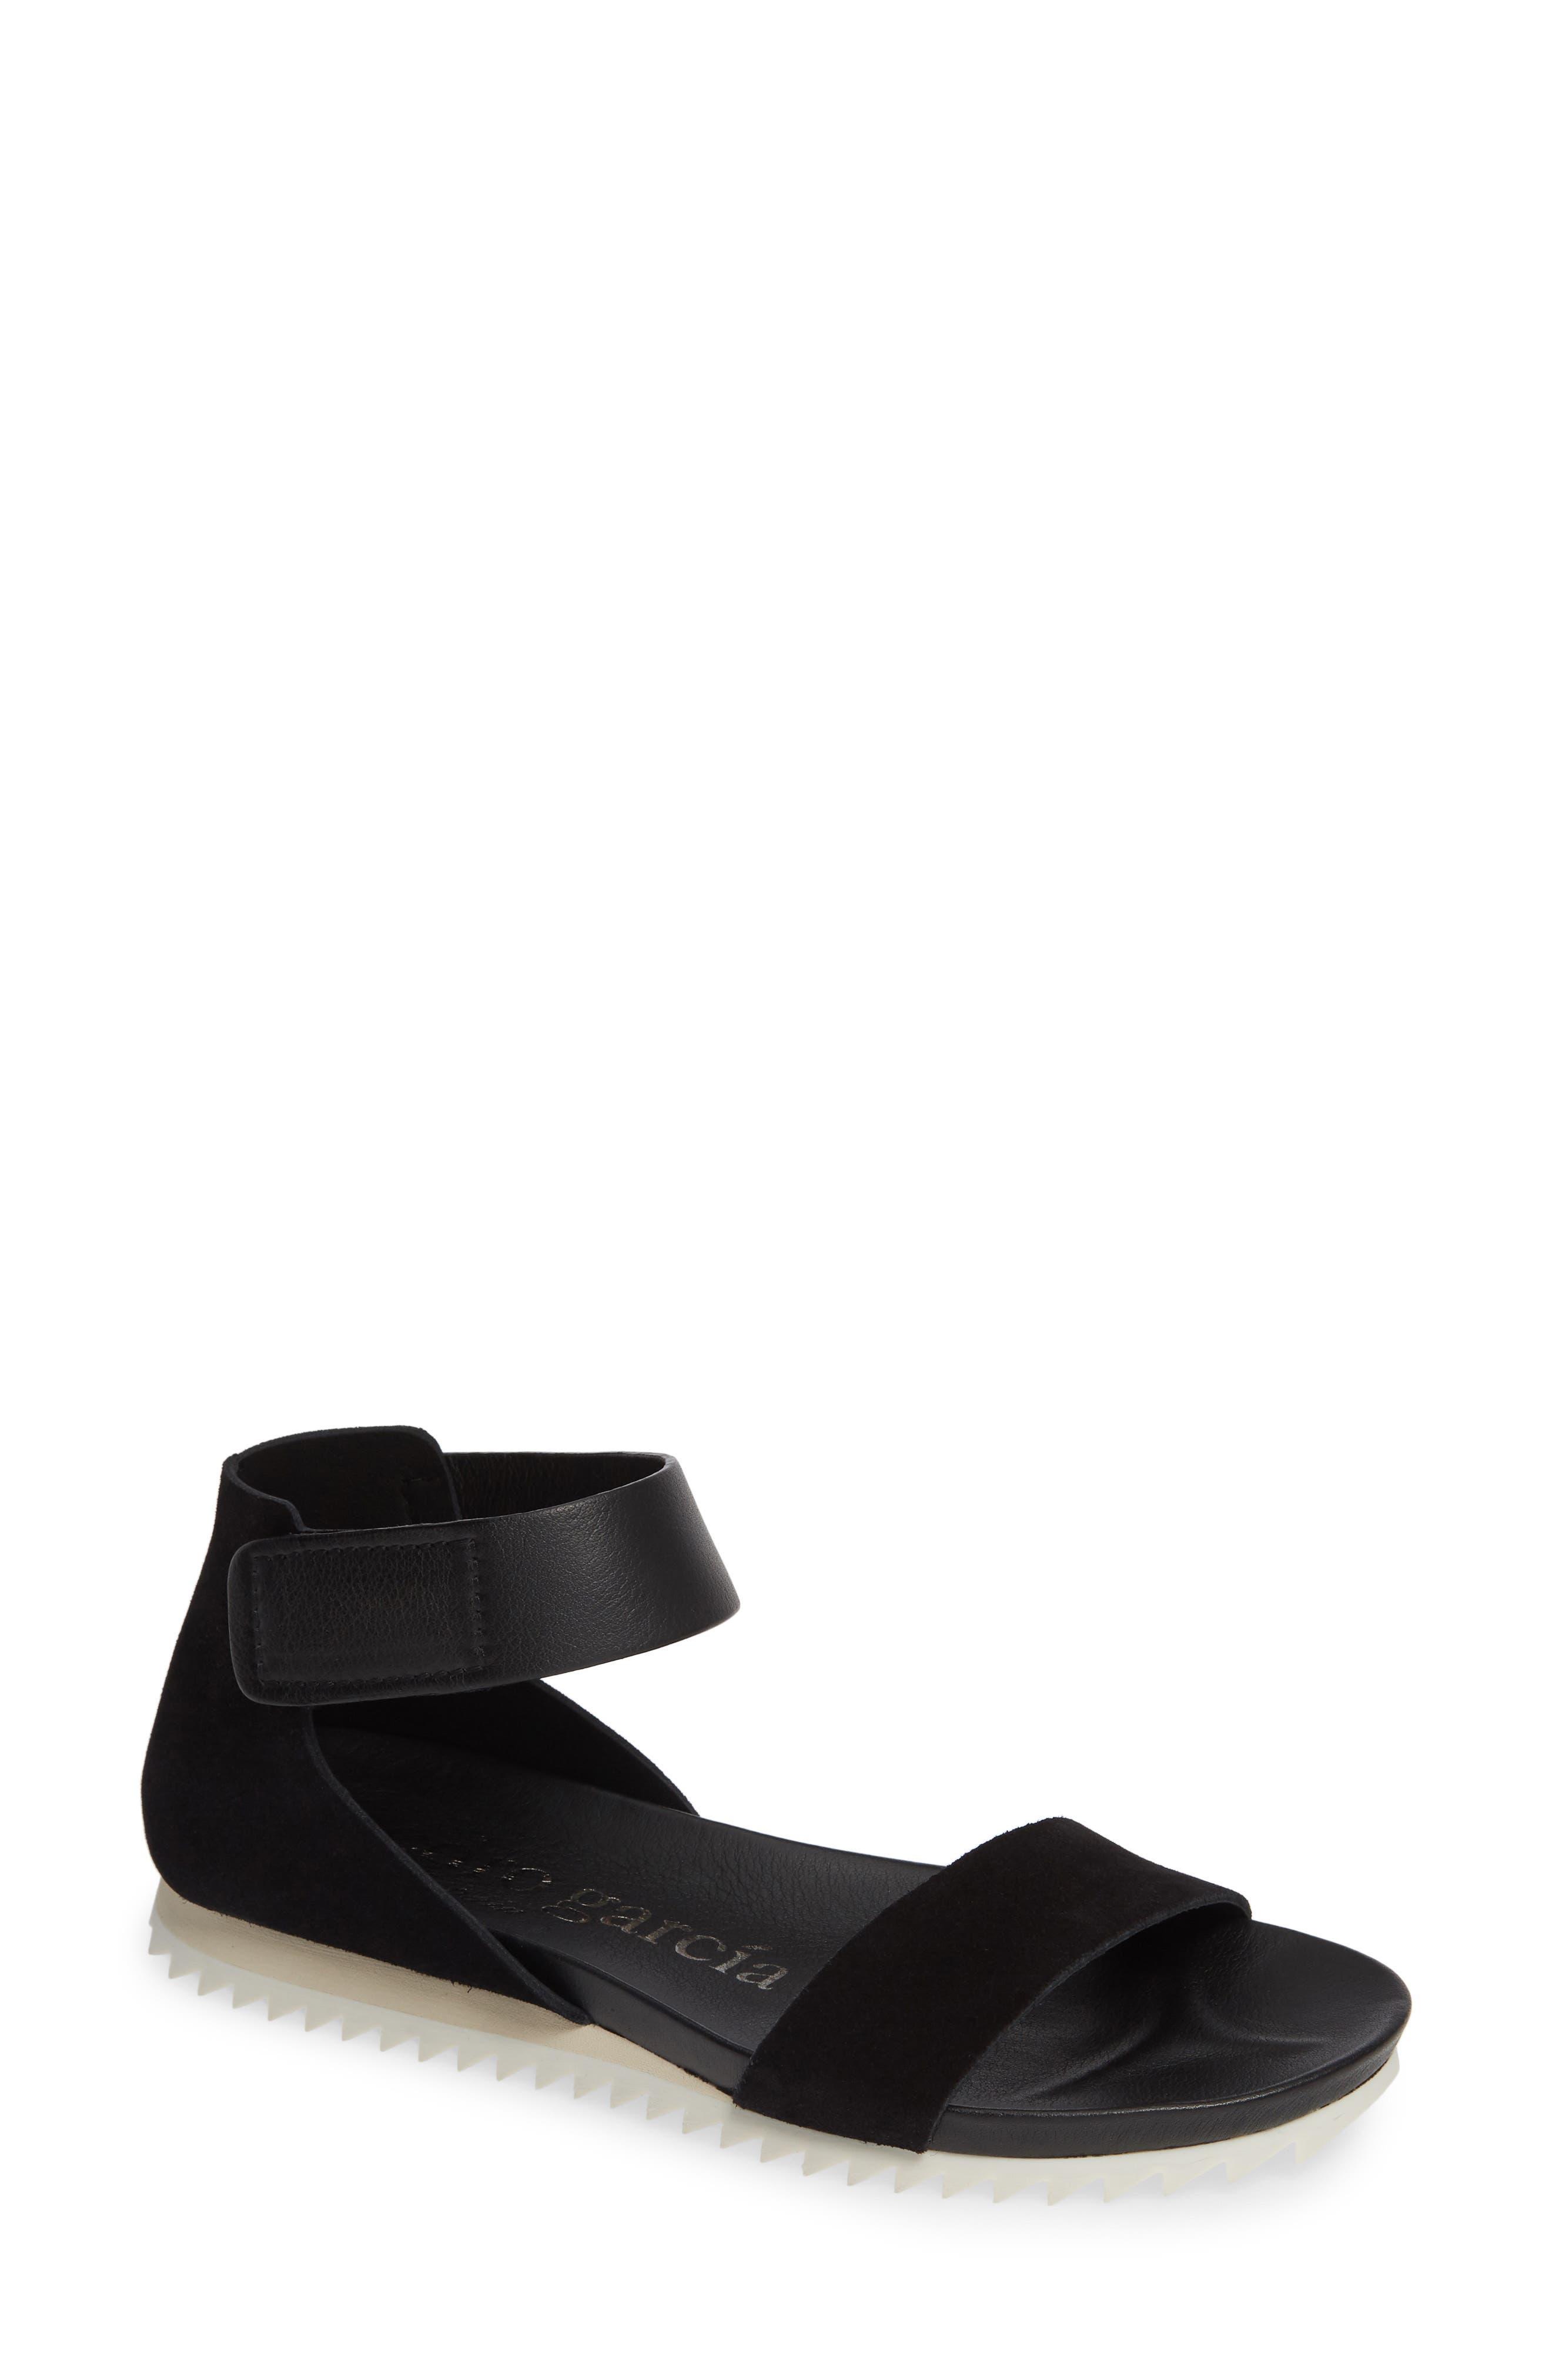 Jenile Ankle Cuff Sandal, Main, color, BLACK CASTORO